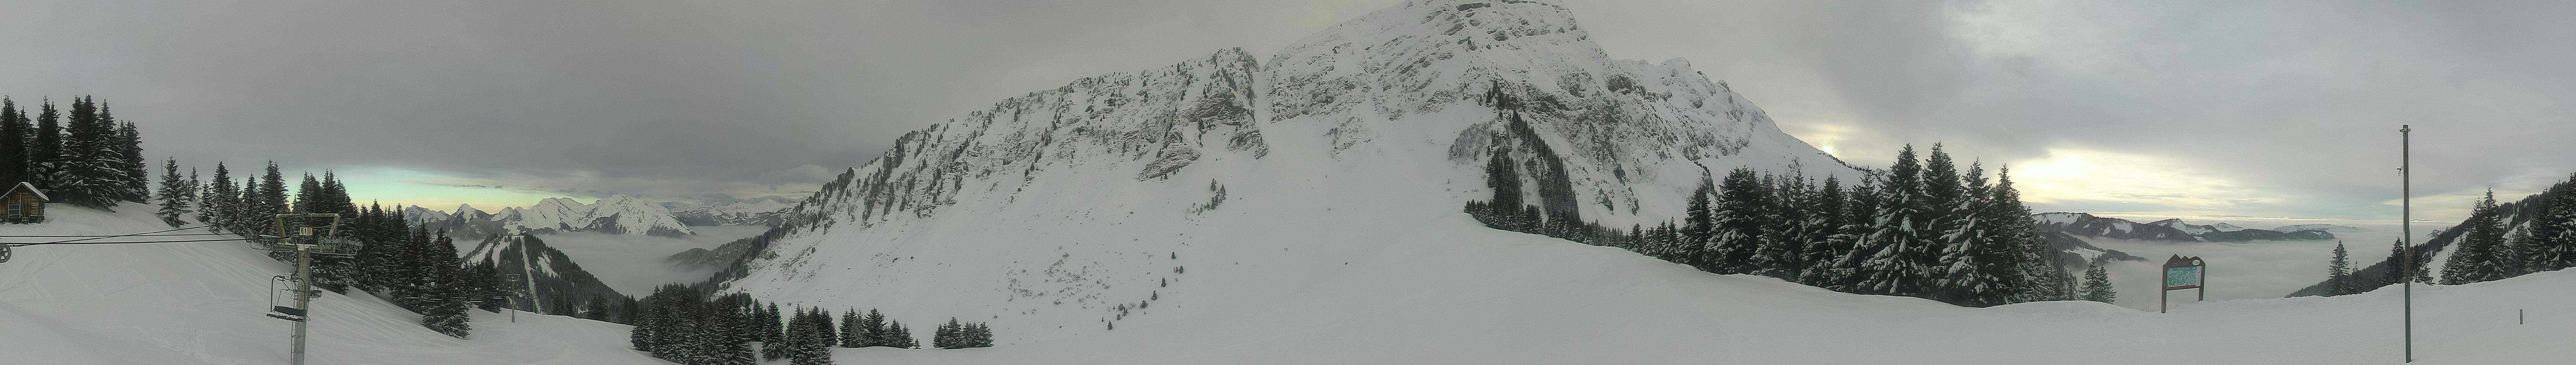 Webcam - Sommet des Têtes- Vallée d'Aulps